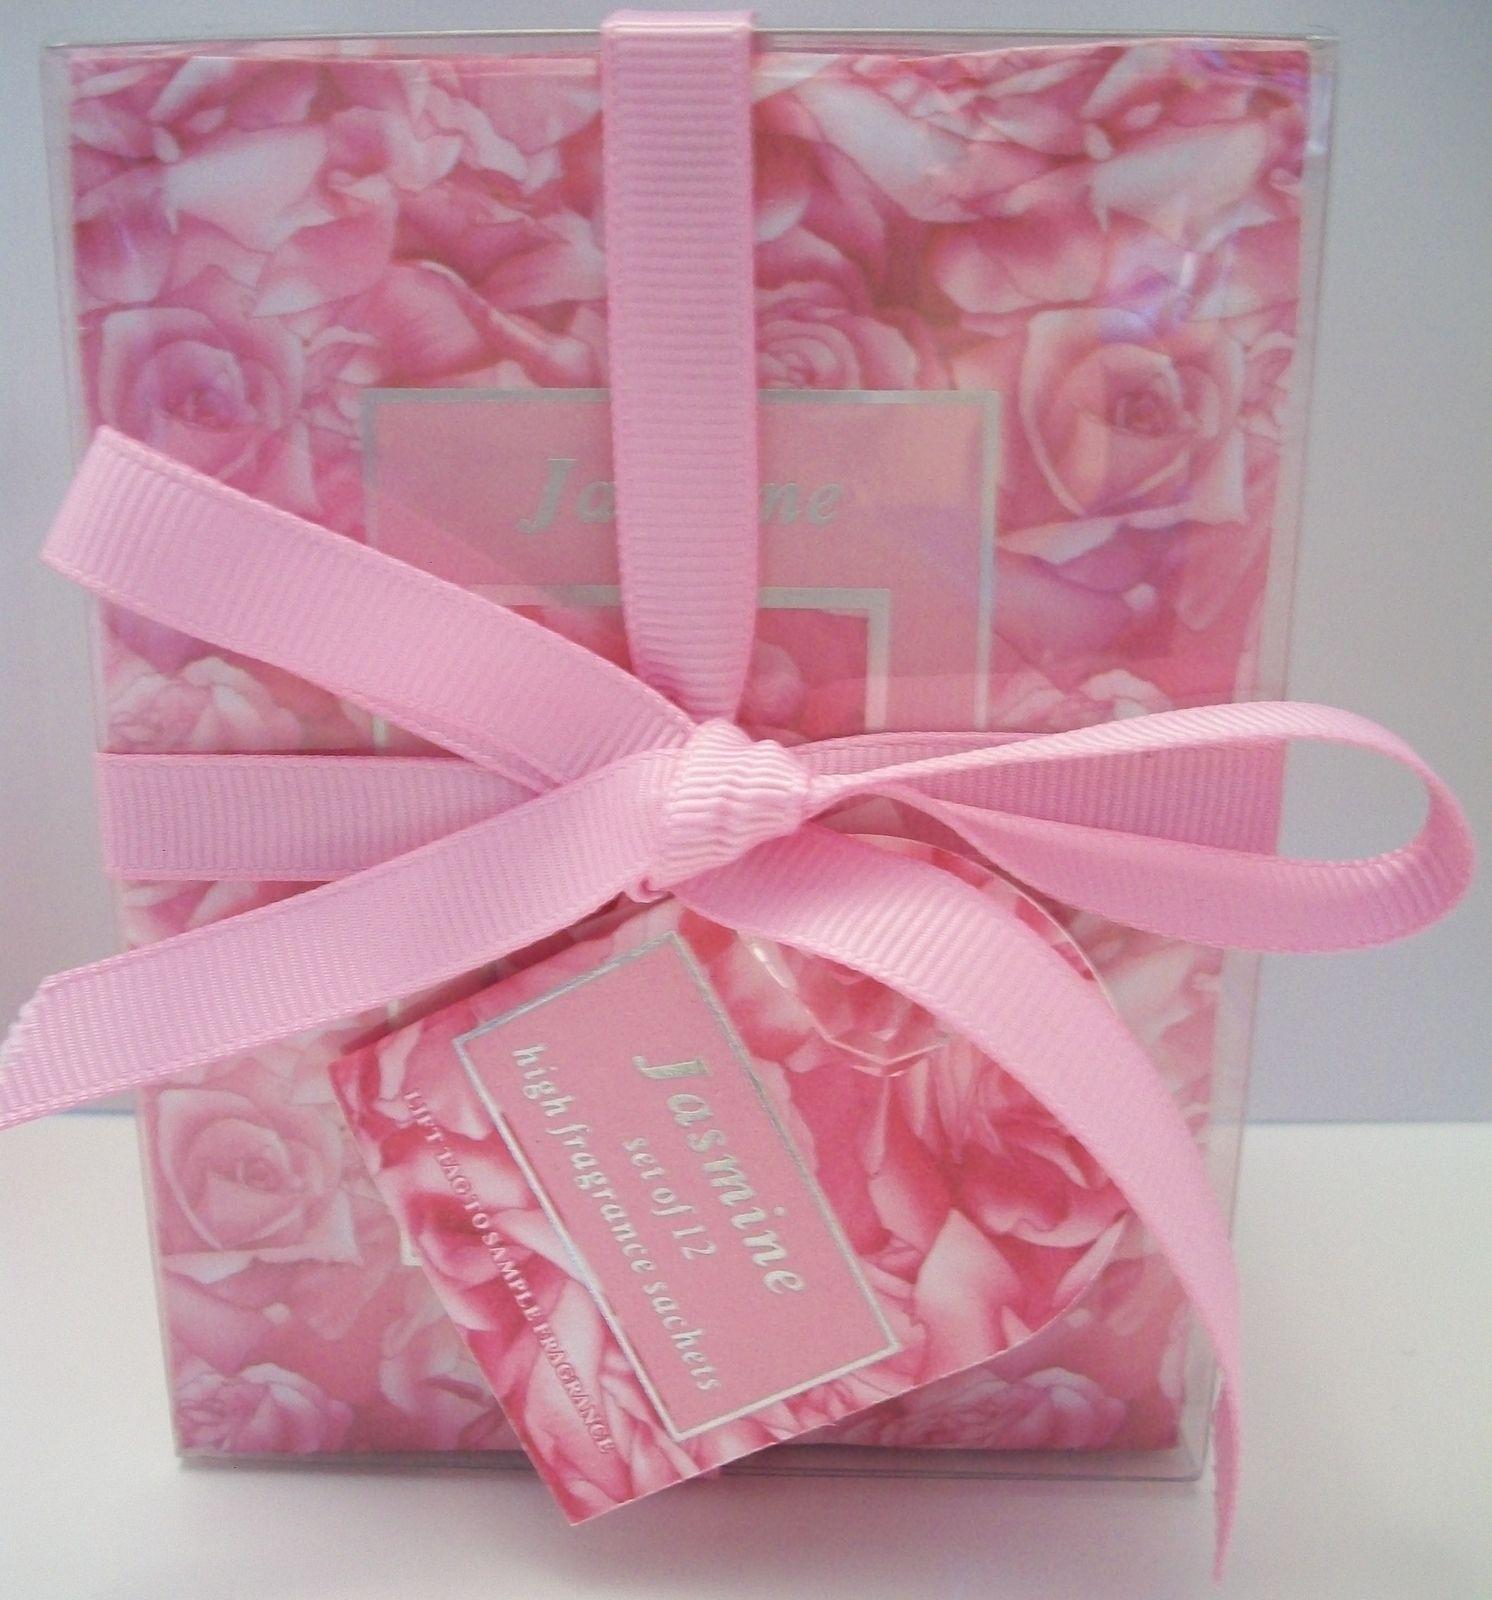 Brand new boxed set of 12 high fragrance Jasmine sachets. Packaged ...